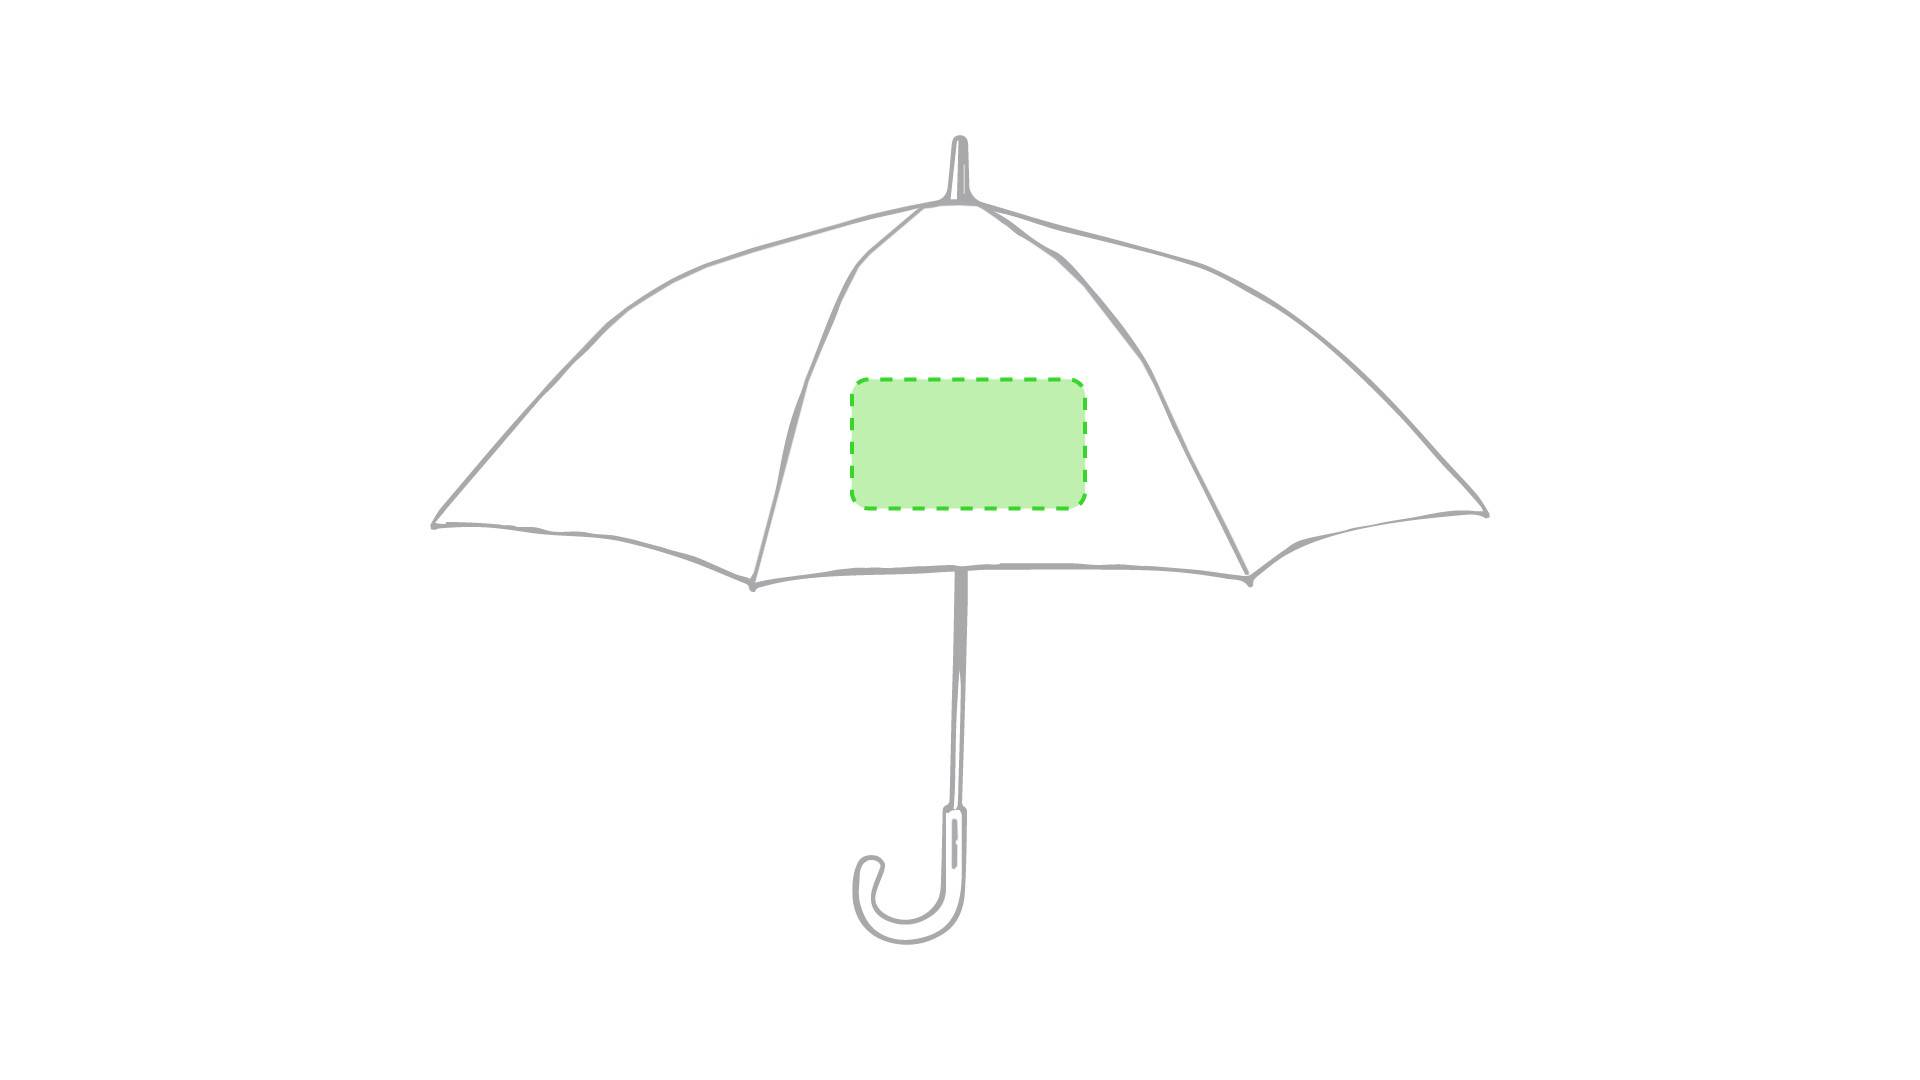 Paraguas bicolor 1